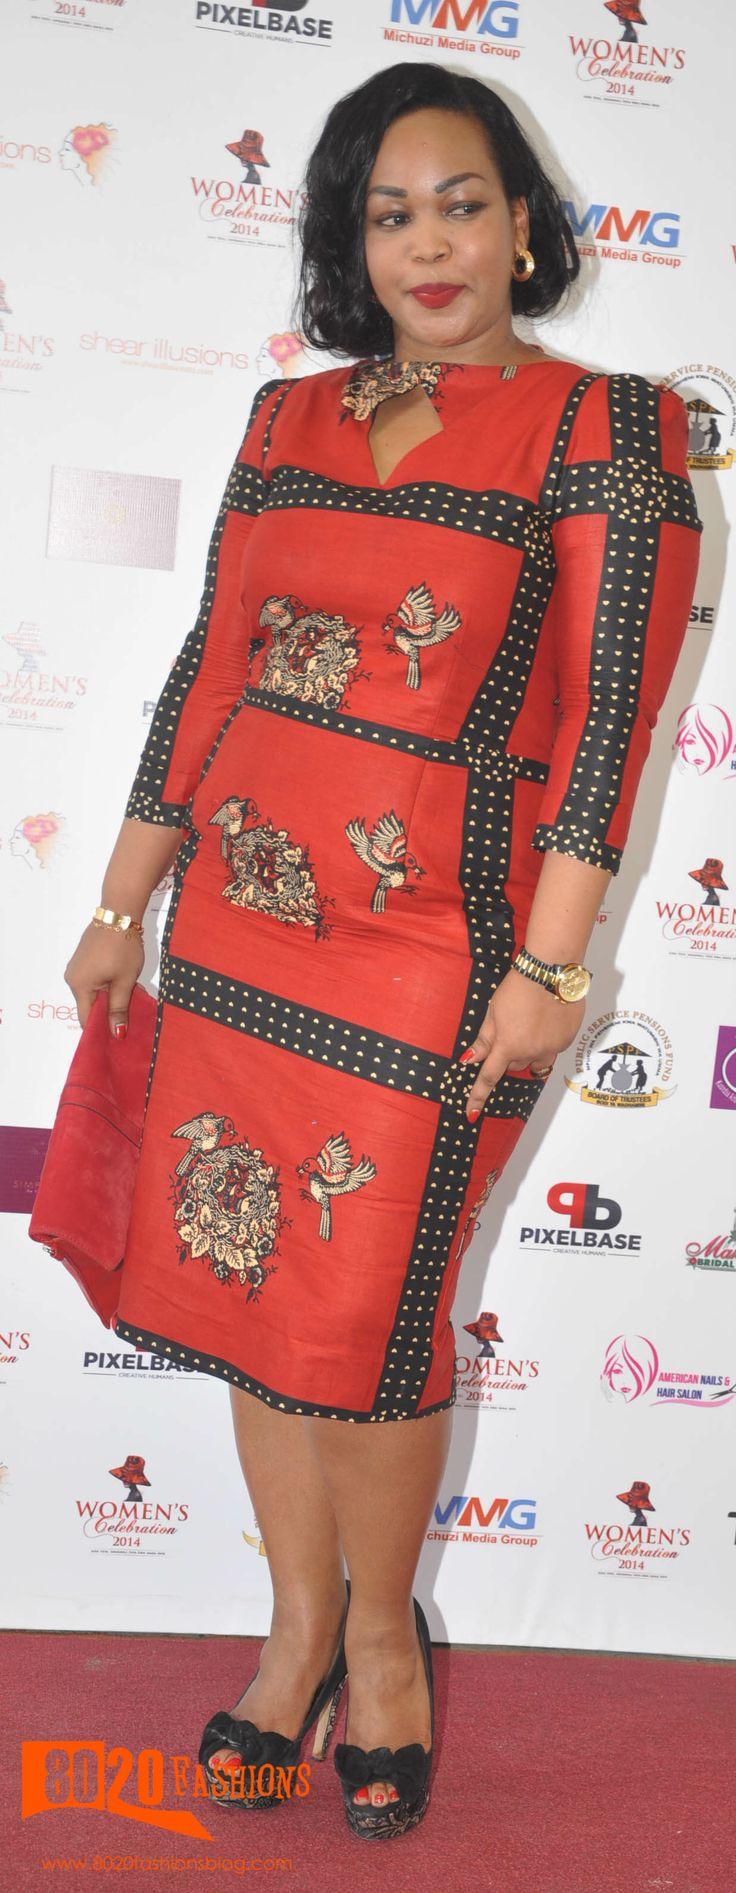 Kitenge Fashion Pictures Kitenge Dress Designs Search Results Calendar 2015 Kitenge Dresses For